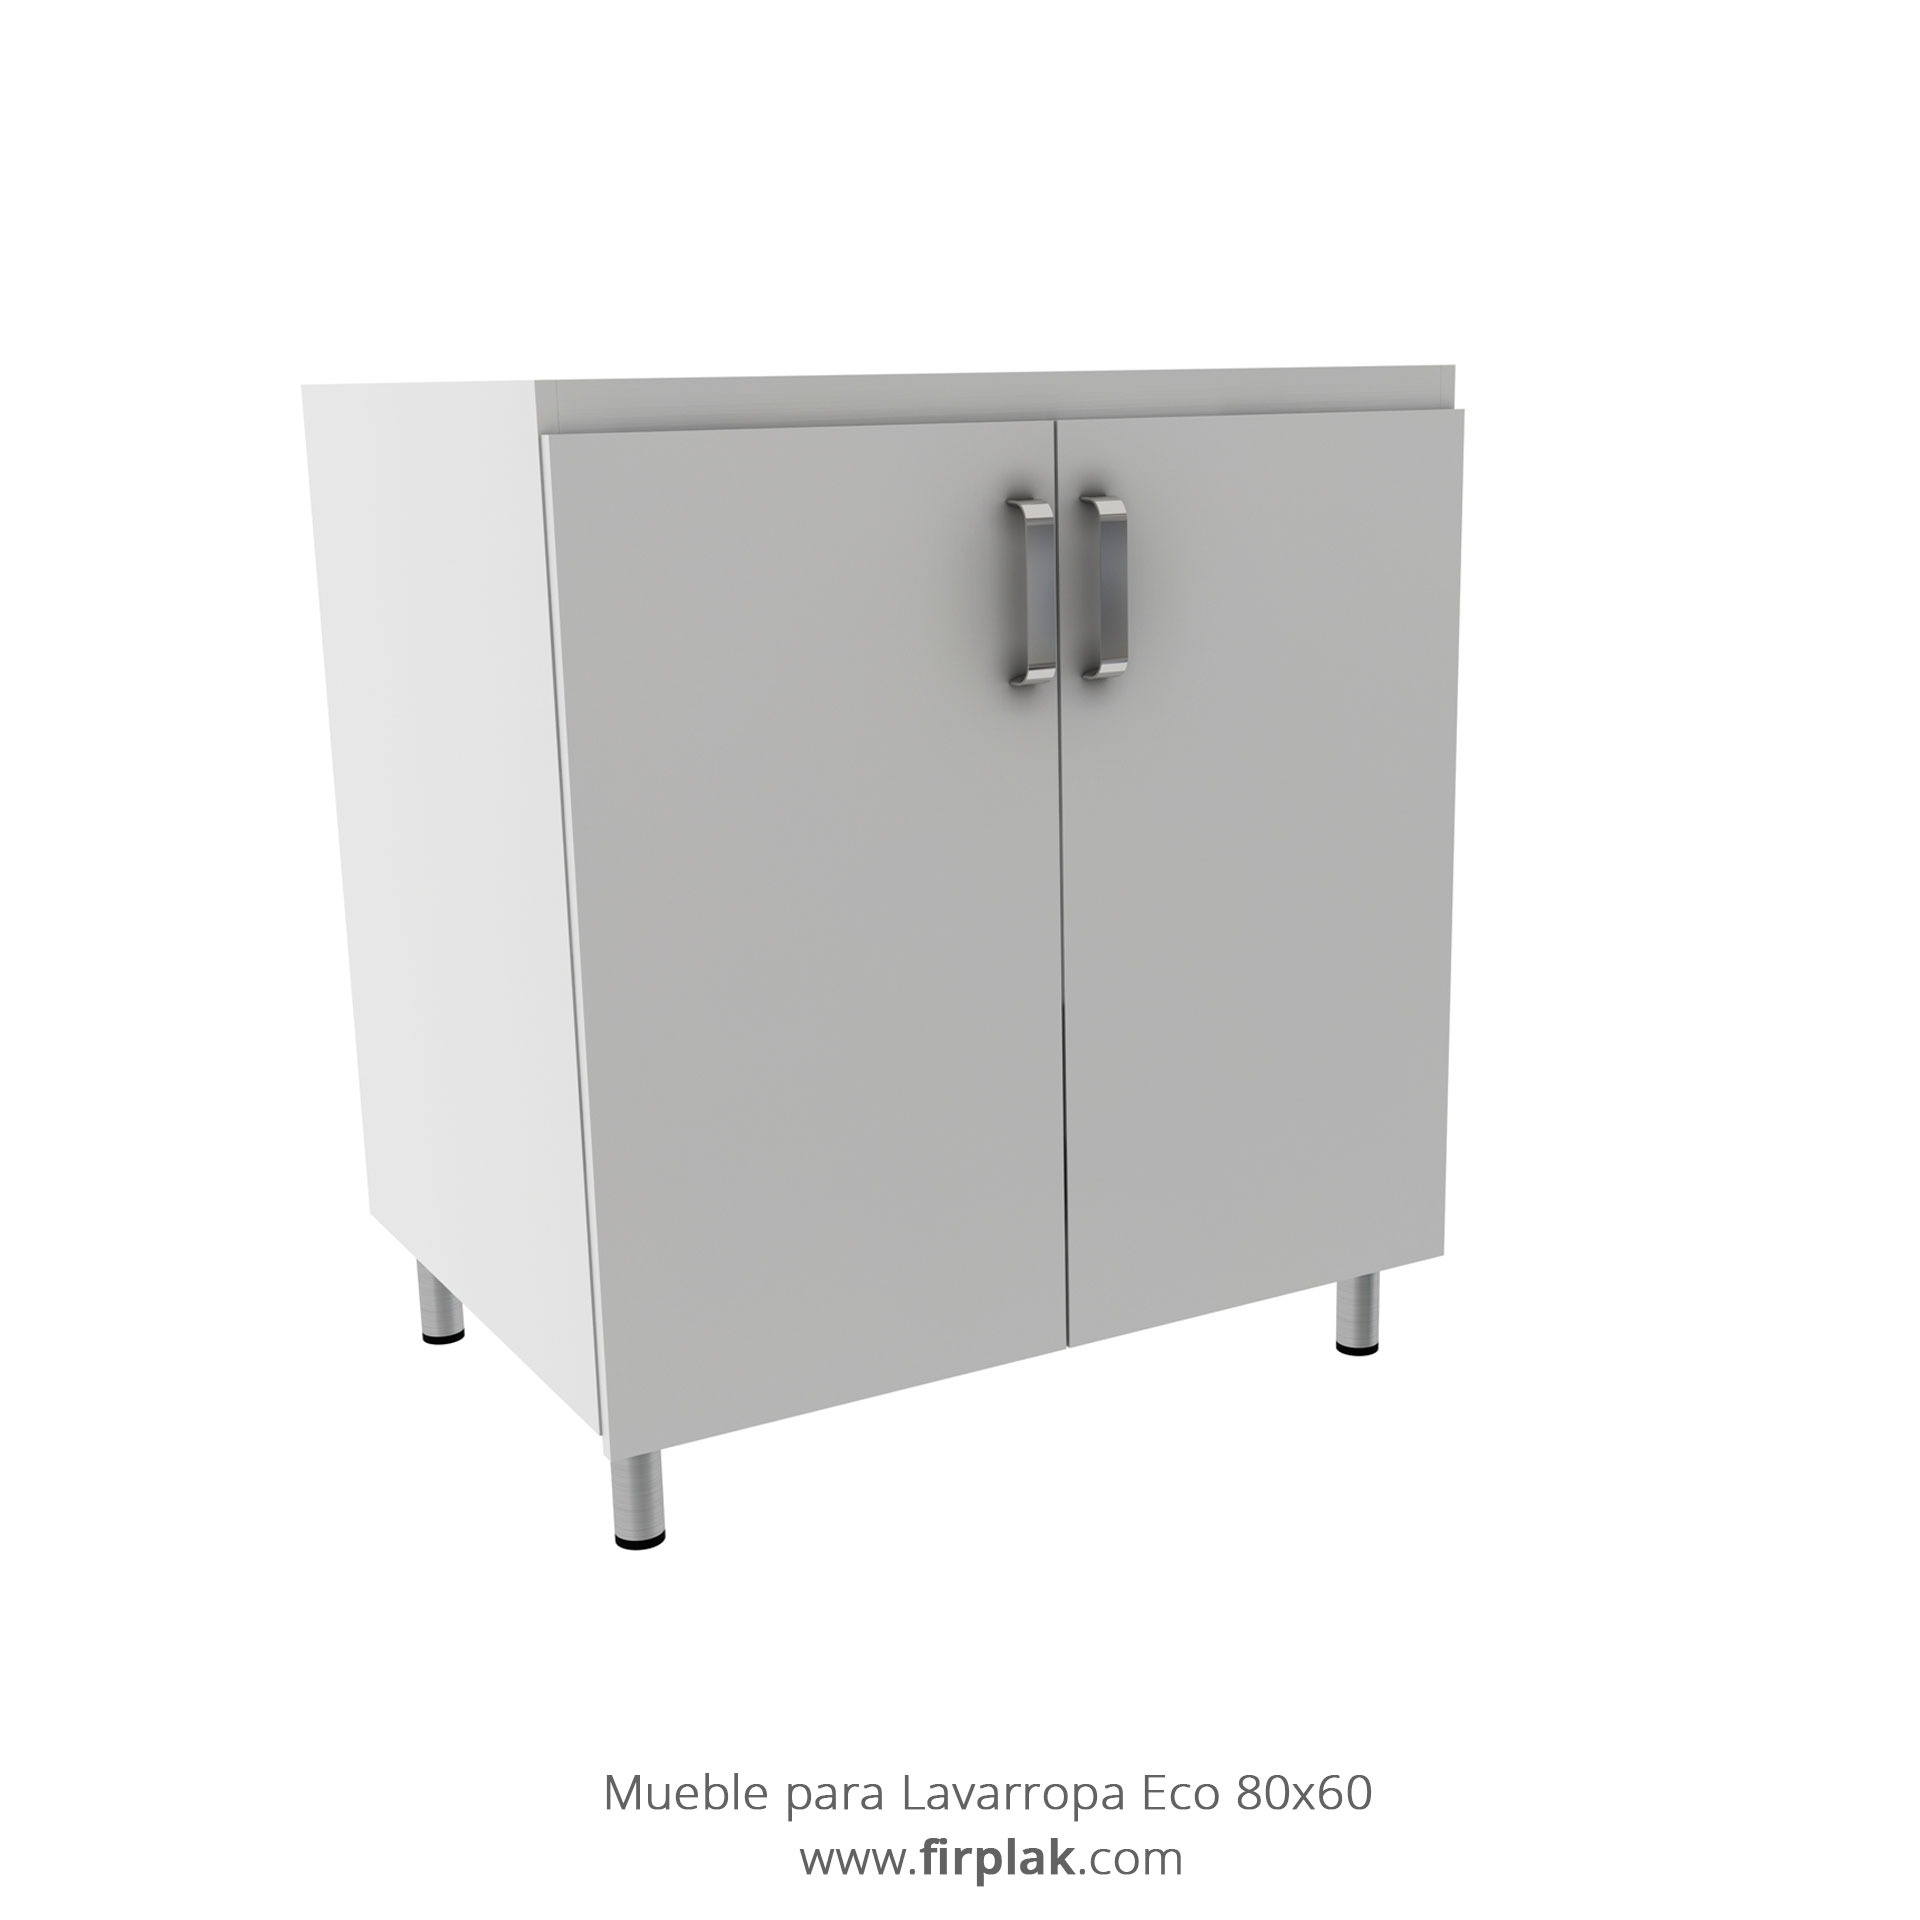 Mueble Lavarropas Eco 80 60 1 Firplak